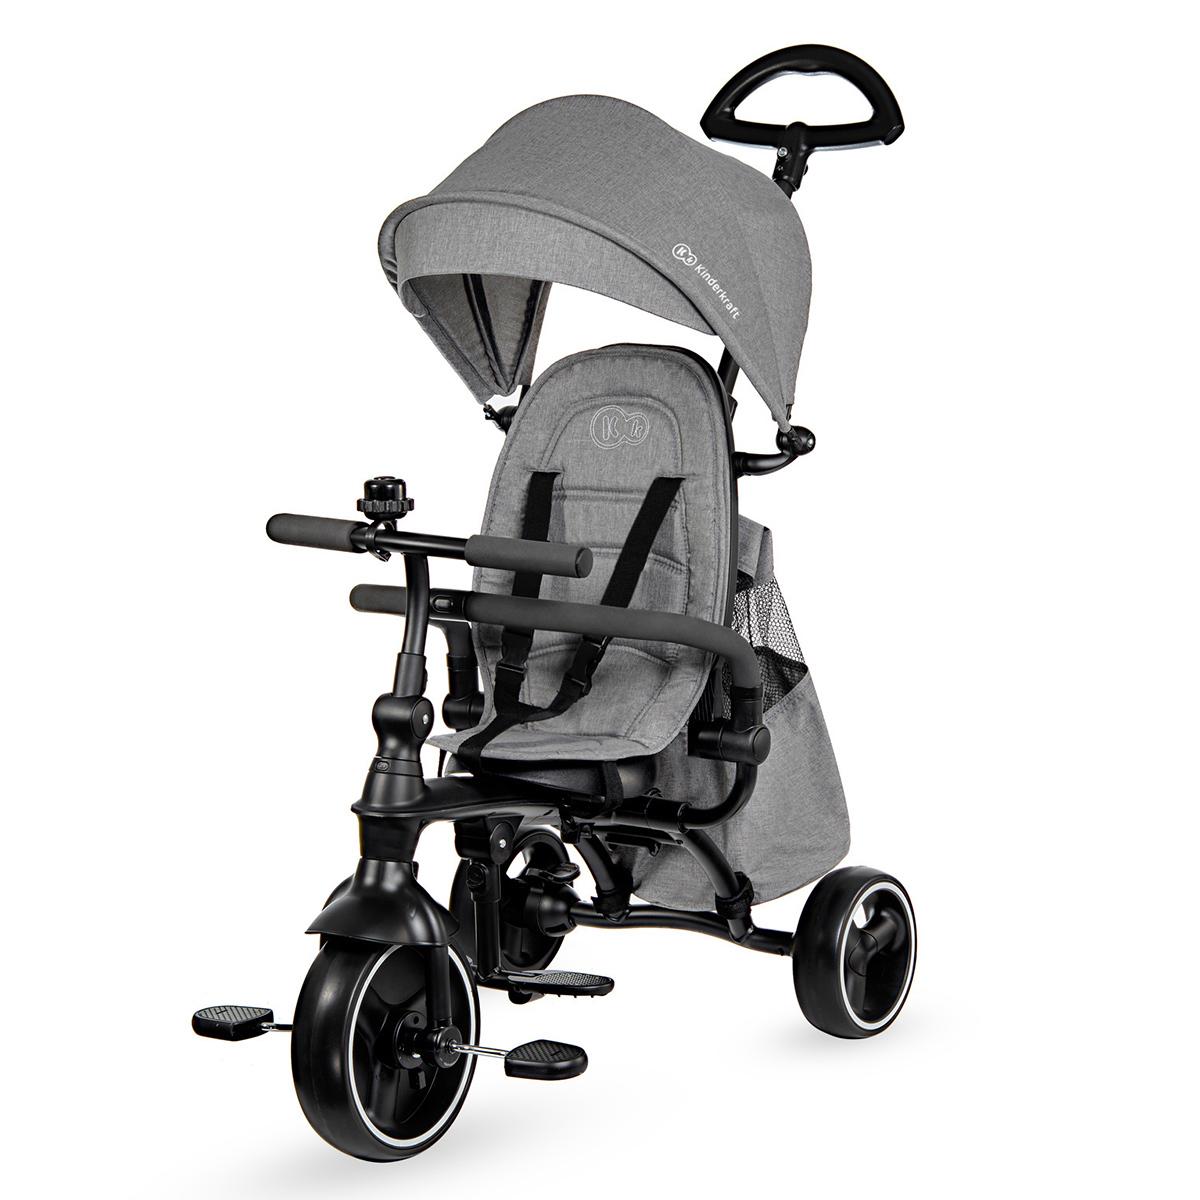 Trotteur & Porteur Tricycle JAZZ - Grey Tricycle JAZZ - Grey